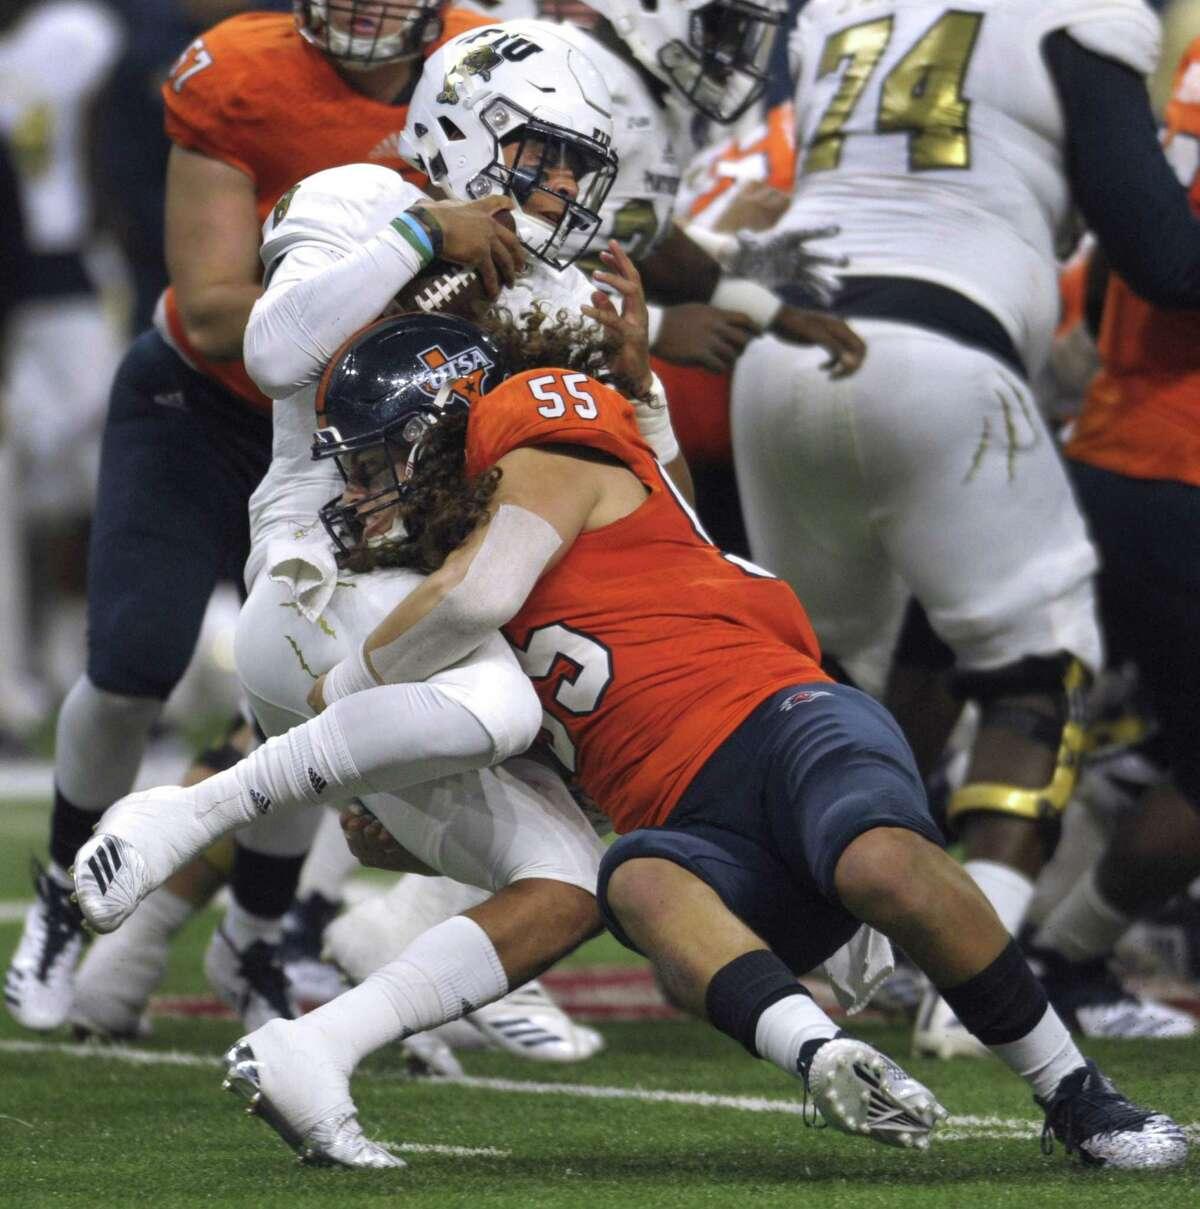 UTSA linebacker Josiah Tauaefa tackles FIU quarterback Christian Alexander during second-half college football action in the San Antonio Alamodome on Saturday, Nov. 10, 2018.